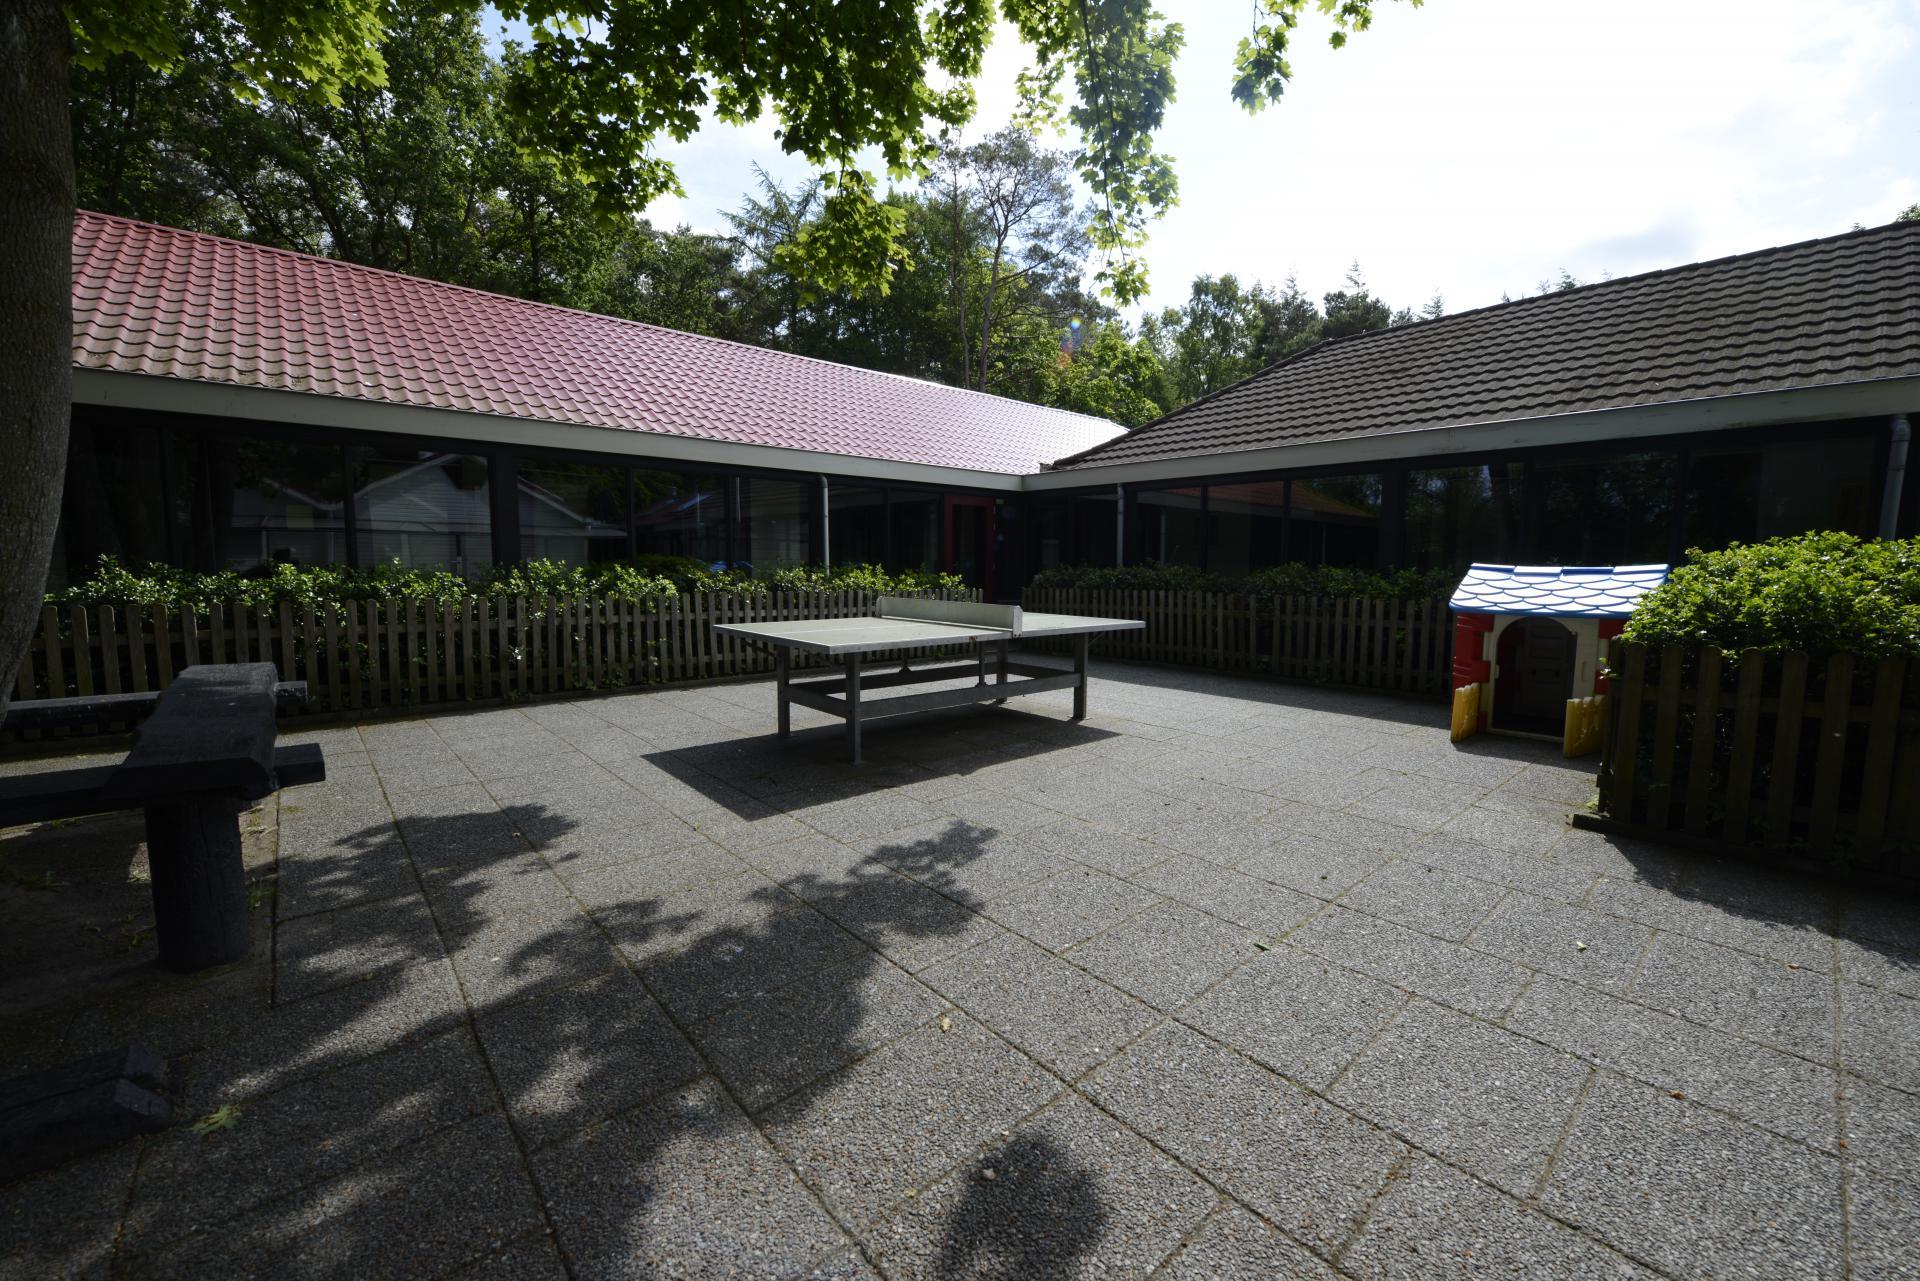 Groepsaccommodatie Drenthe